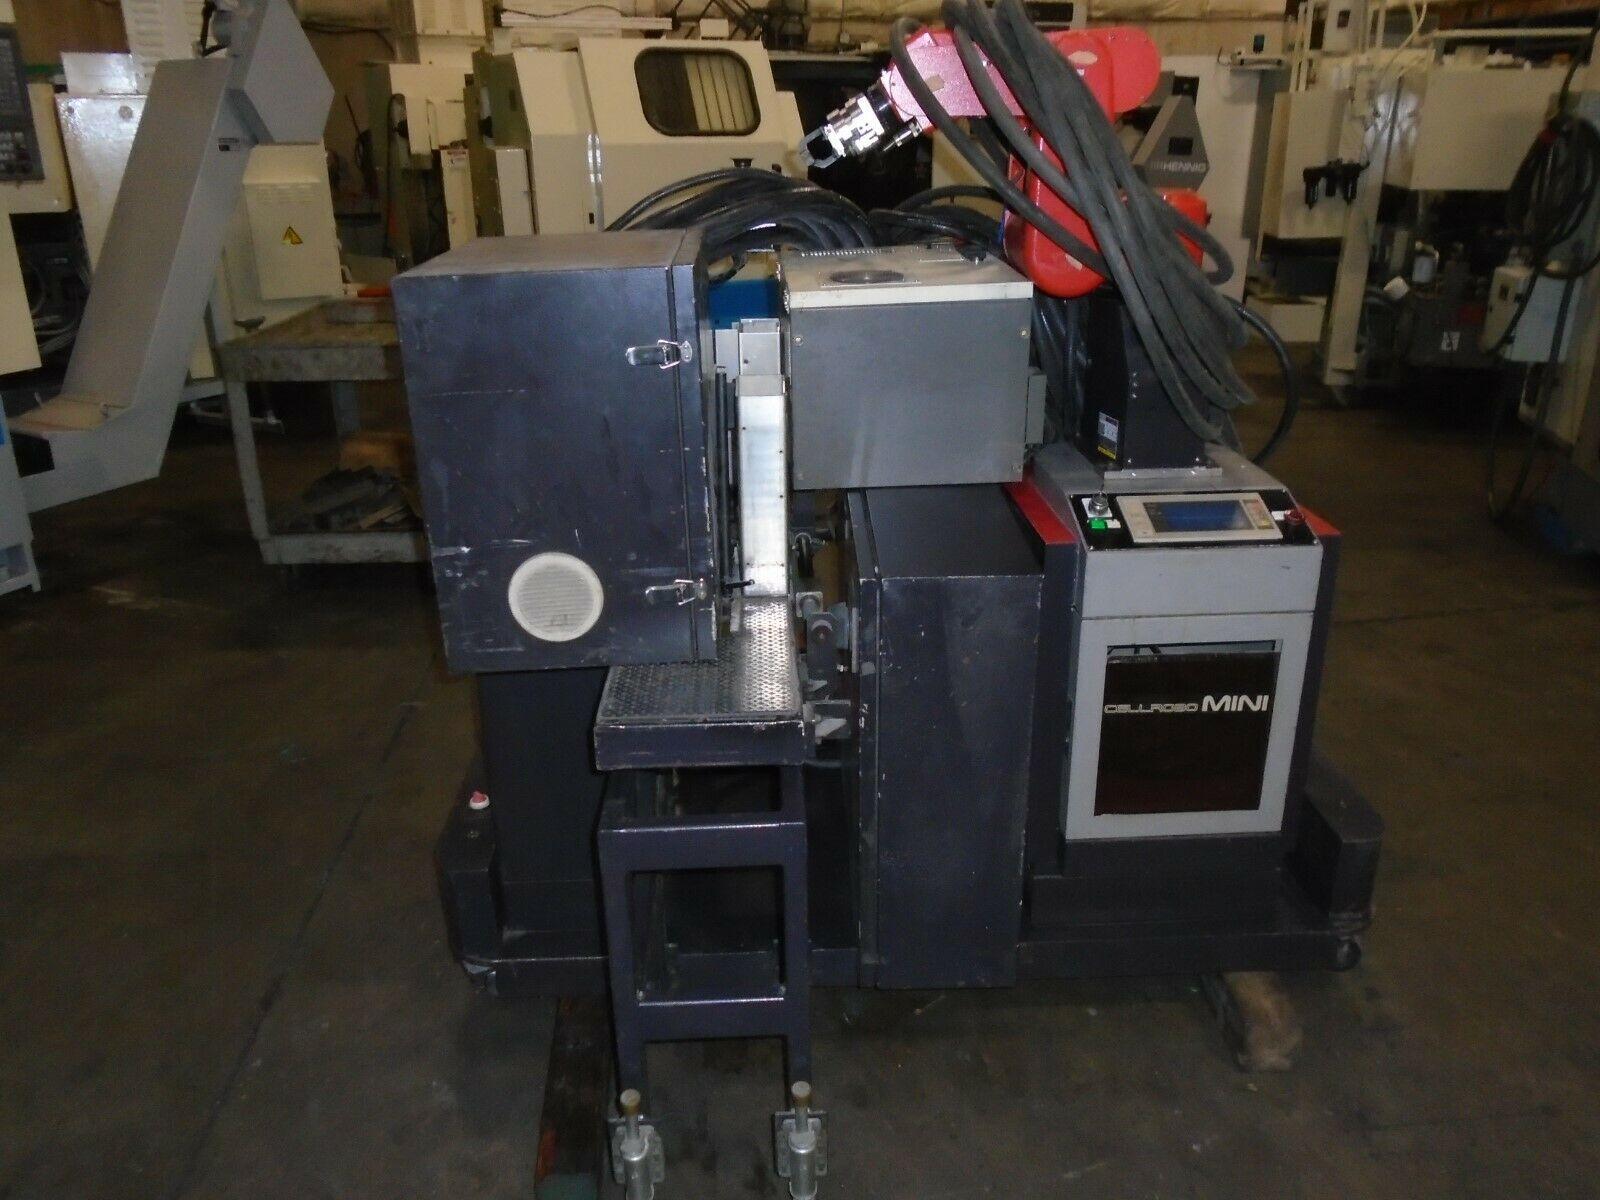 Fanuc Robot LR Mate 100 A5B-1131-8001 Mini Cel R-J2 Control - Image 12 of 12